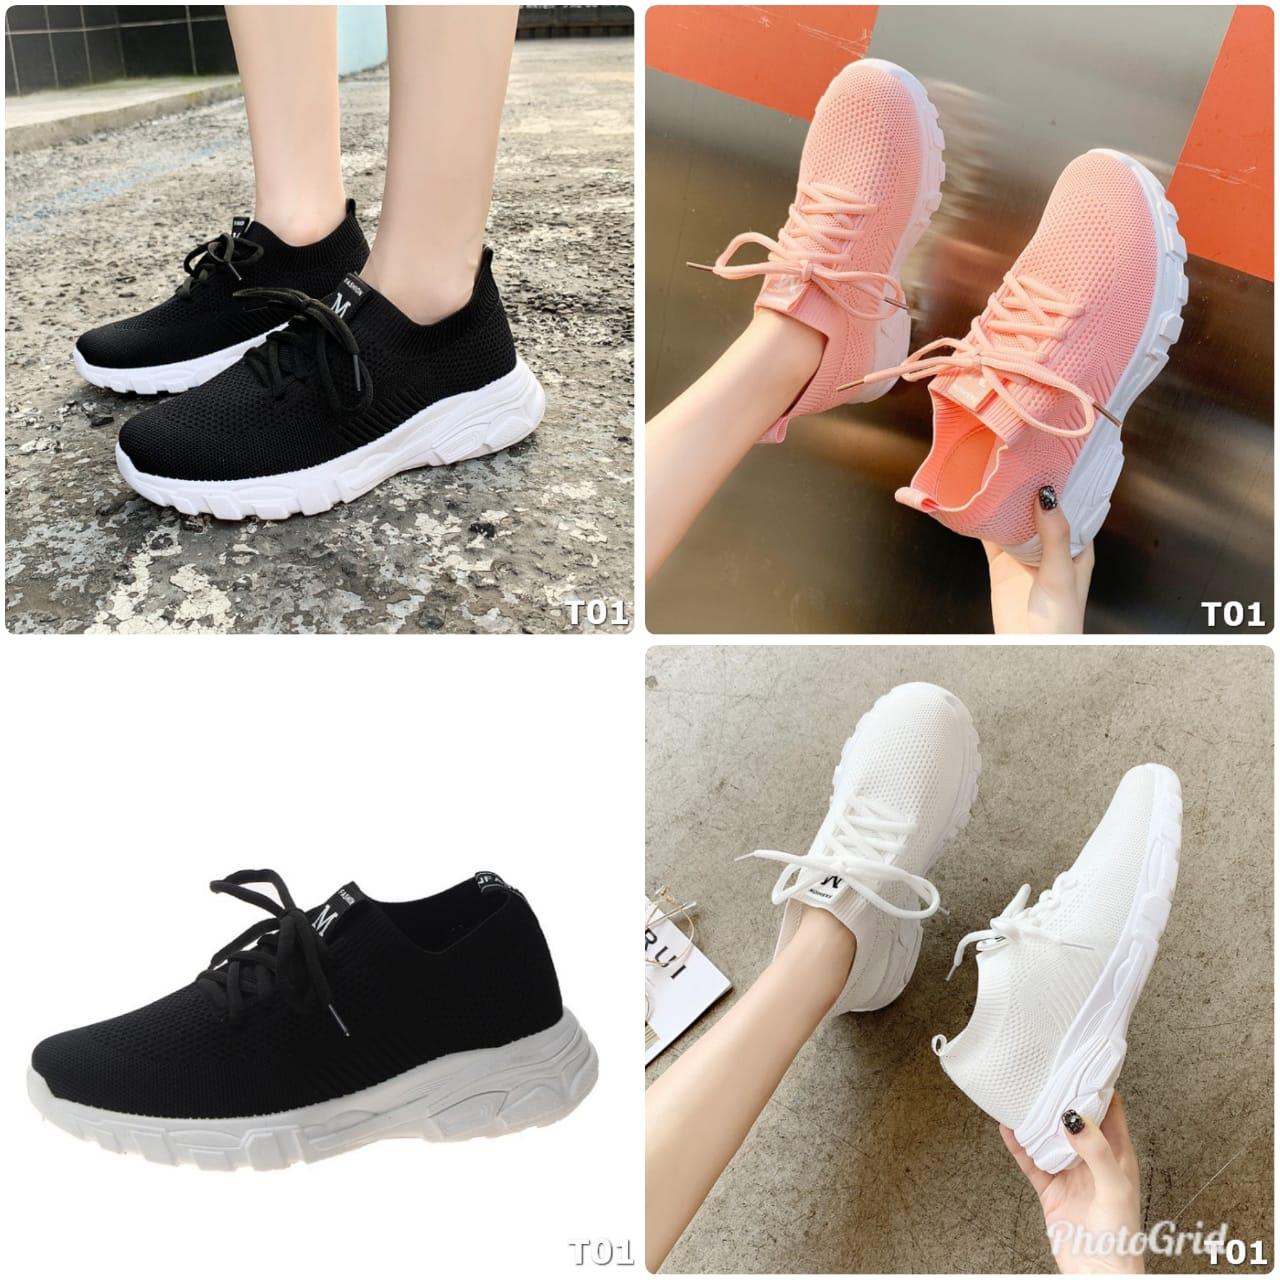 Kode GI 012 : Gloria Flyknit Sneaker Shoes T01 - PSB 9